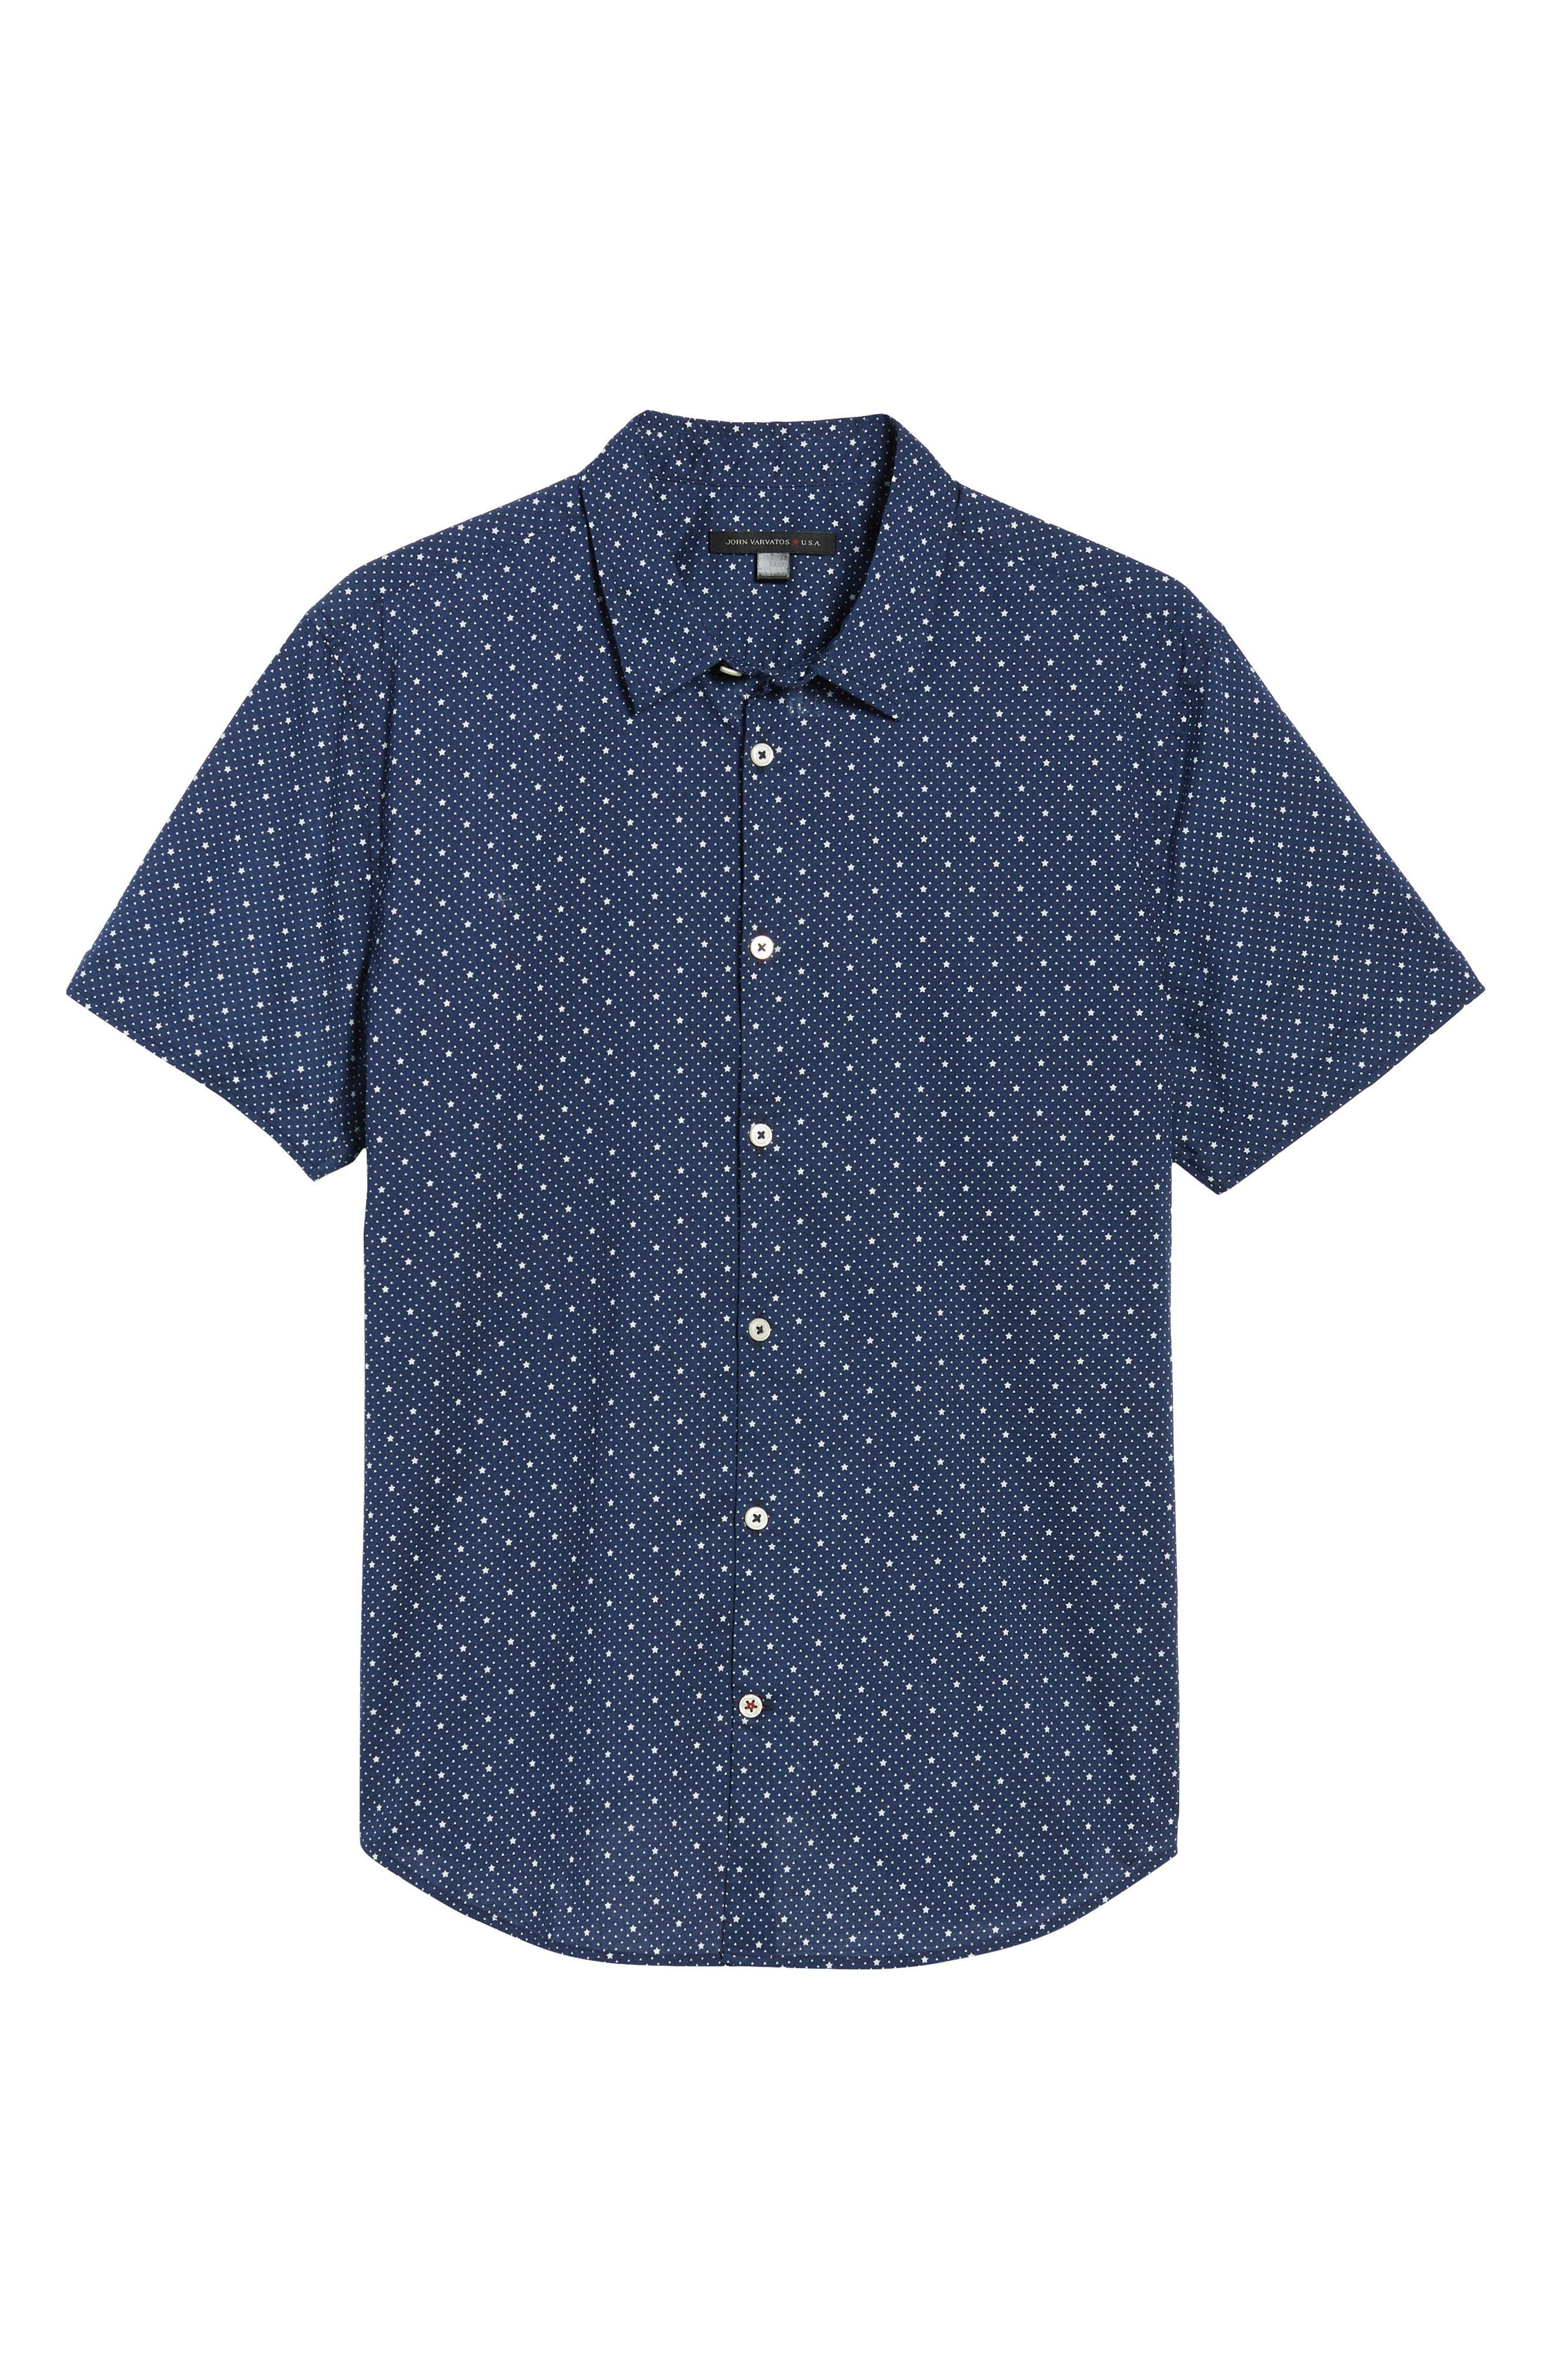 Star Print Woven Shirt,                             Alternate thumbnail 6, color,                             418